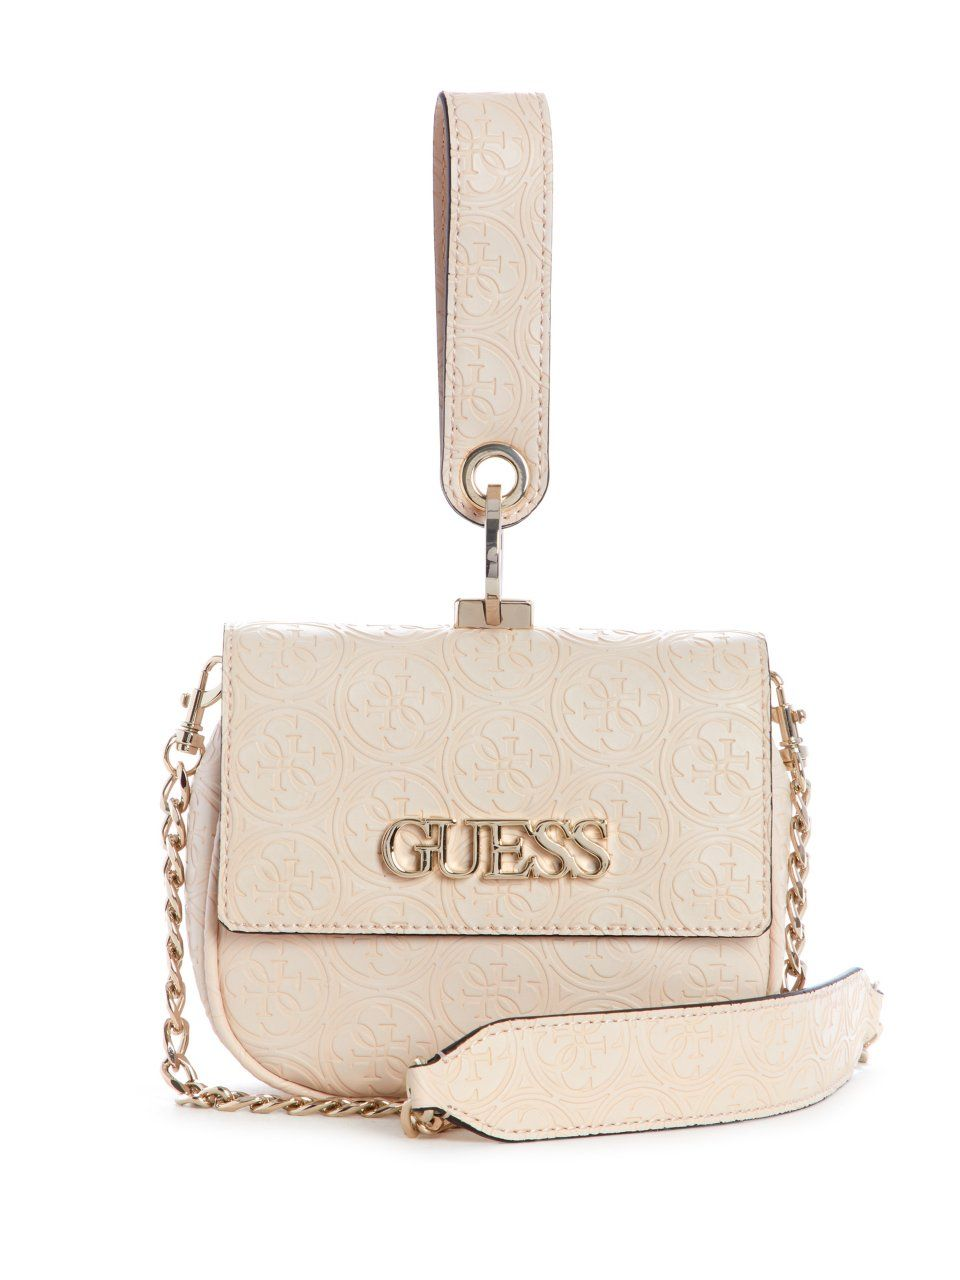 Heritage Pop Mini Crossbody | Guess purses, Fashion, Guess bags